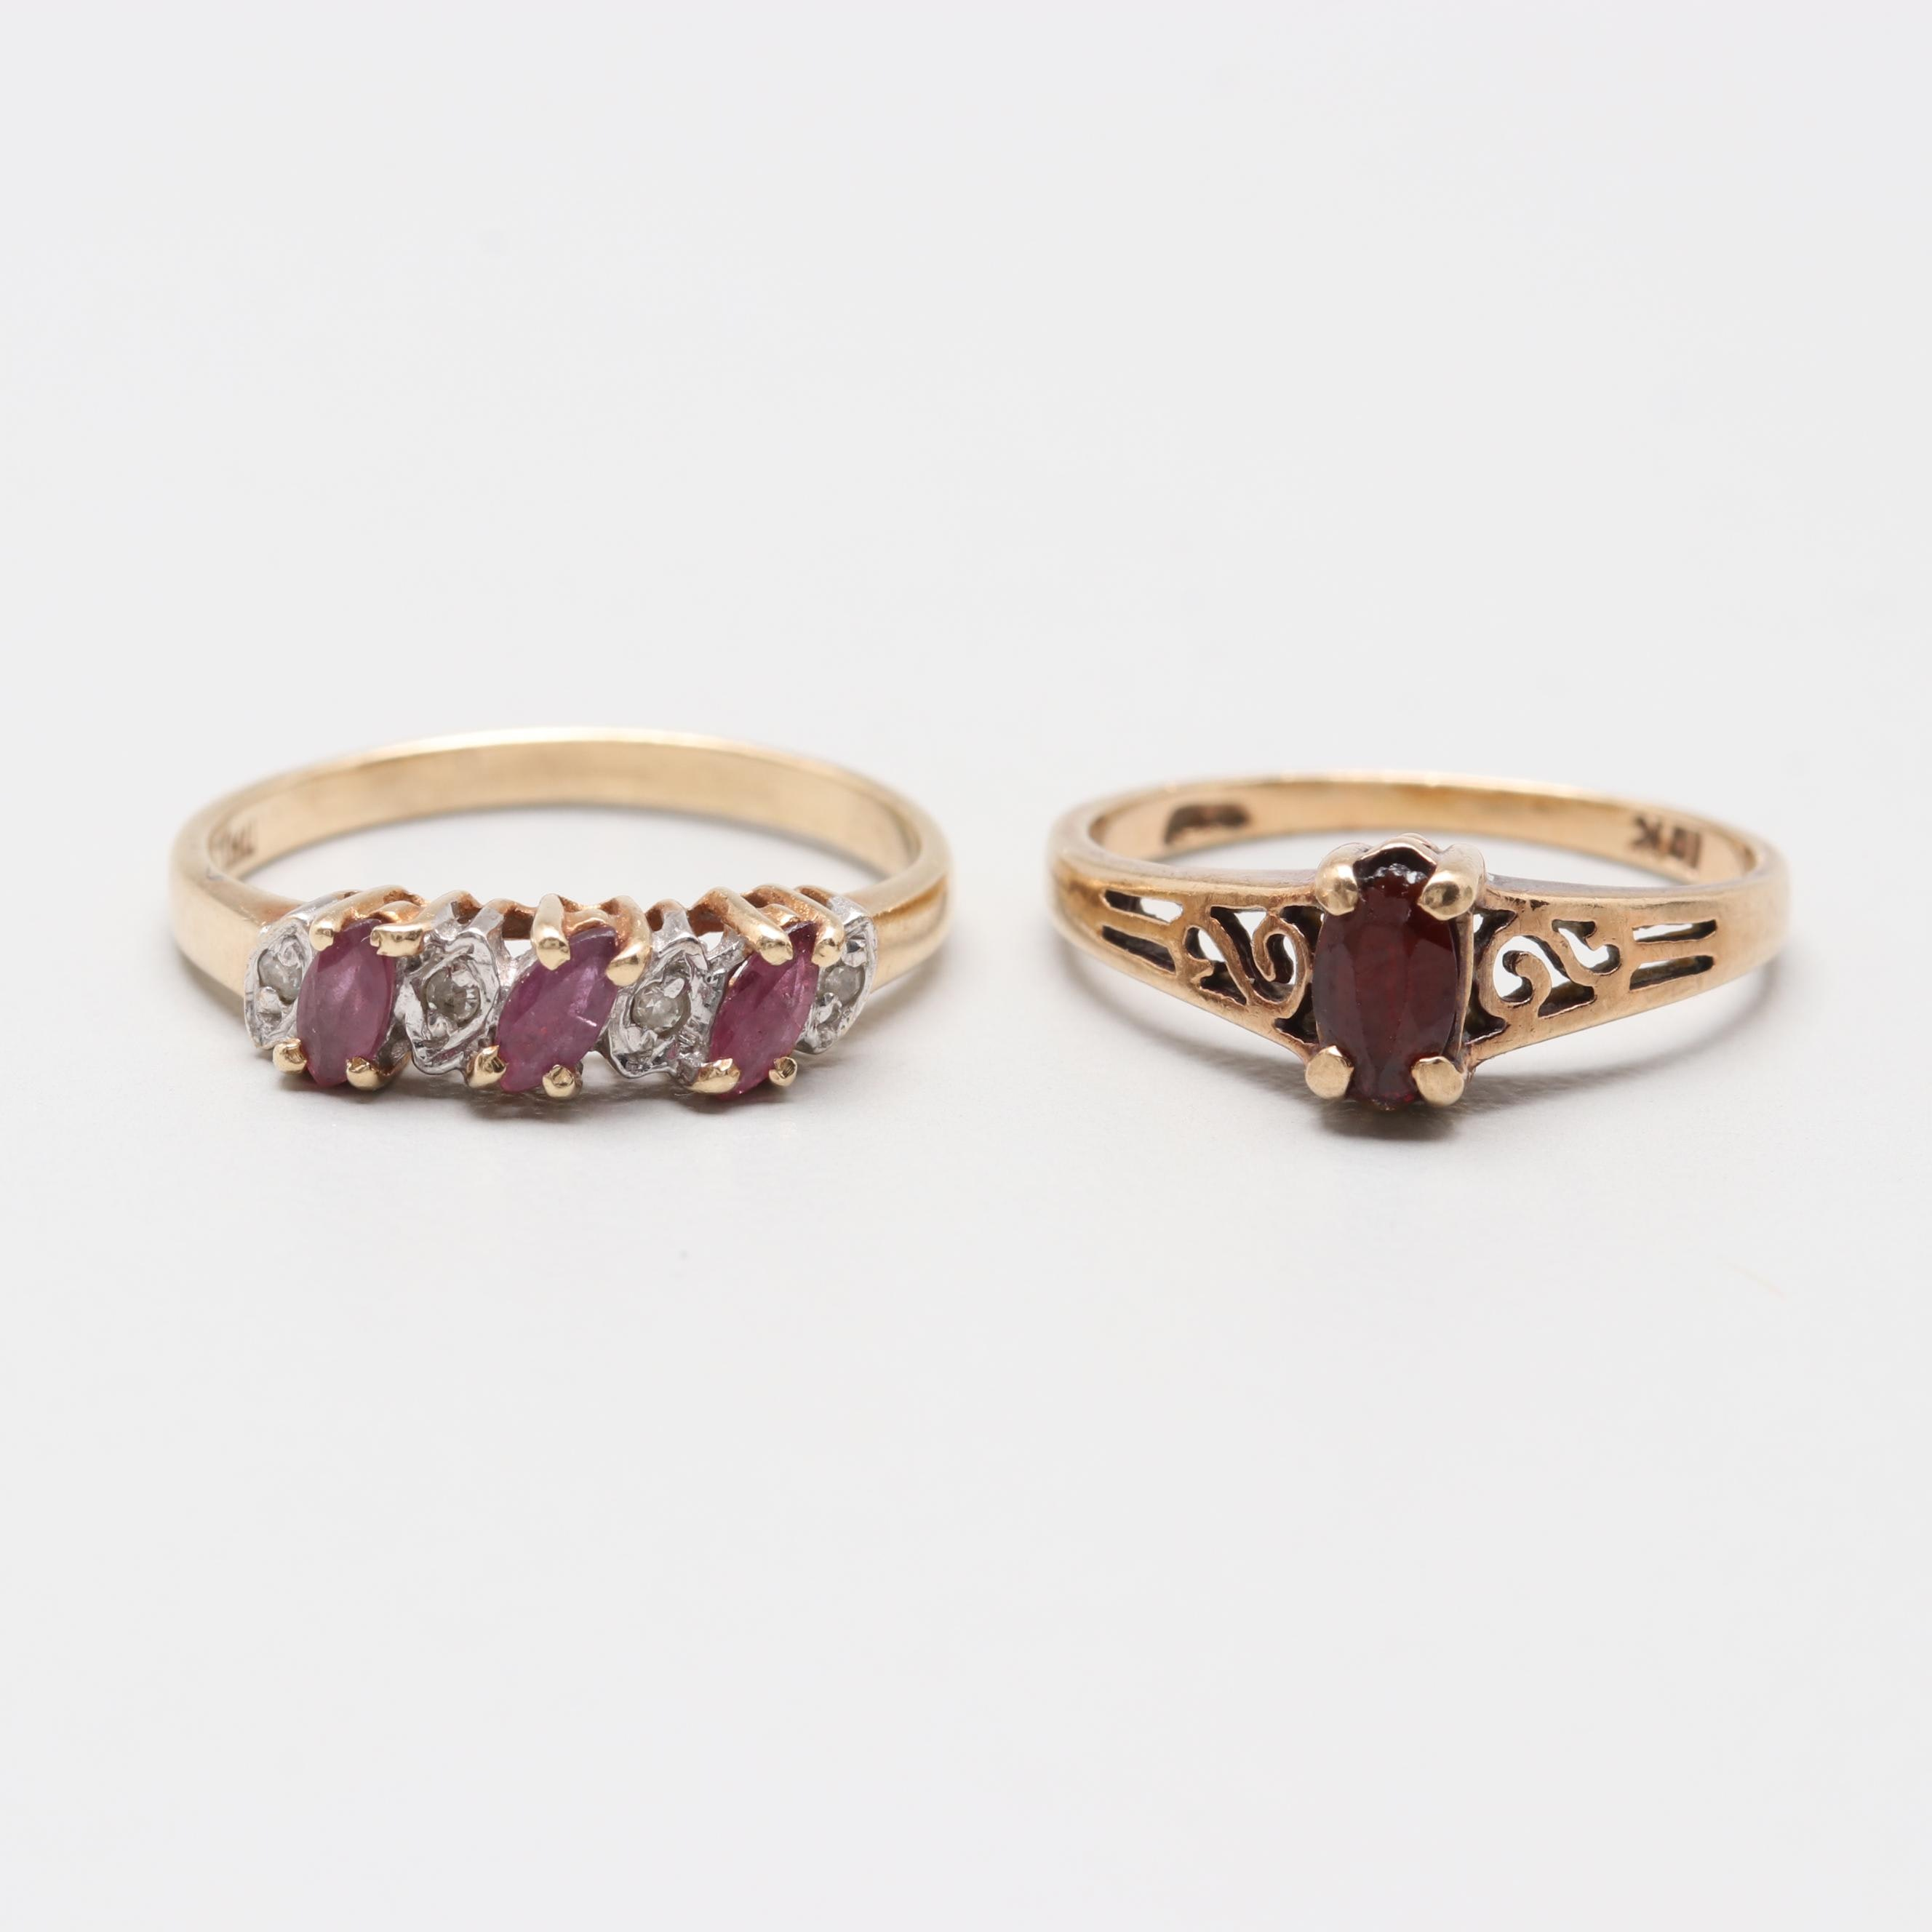 10K Yellow Gold Garnet, Ruby, and Diamond Ring